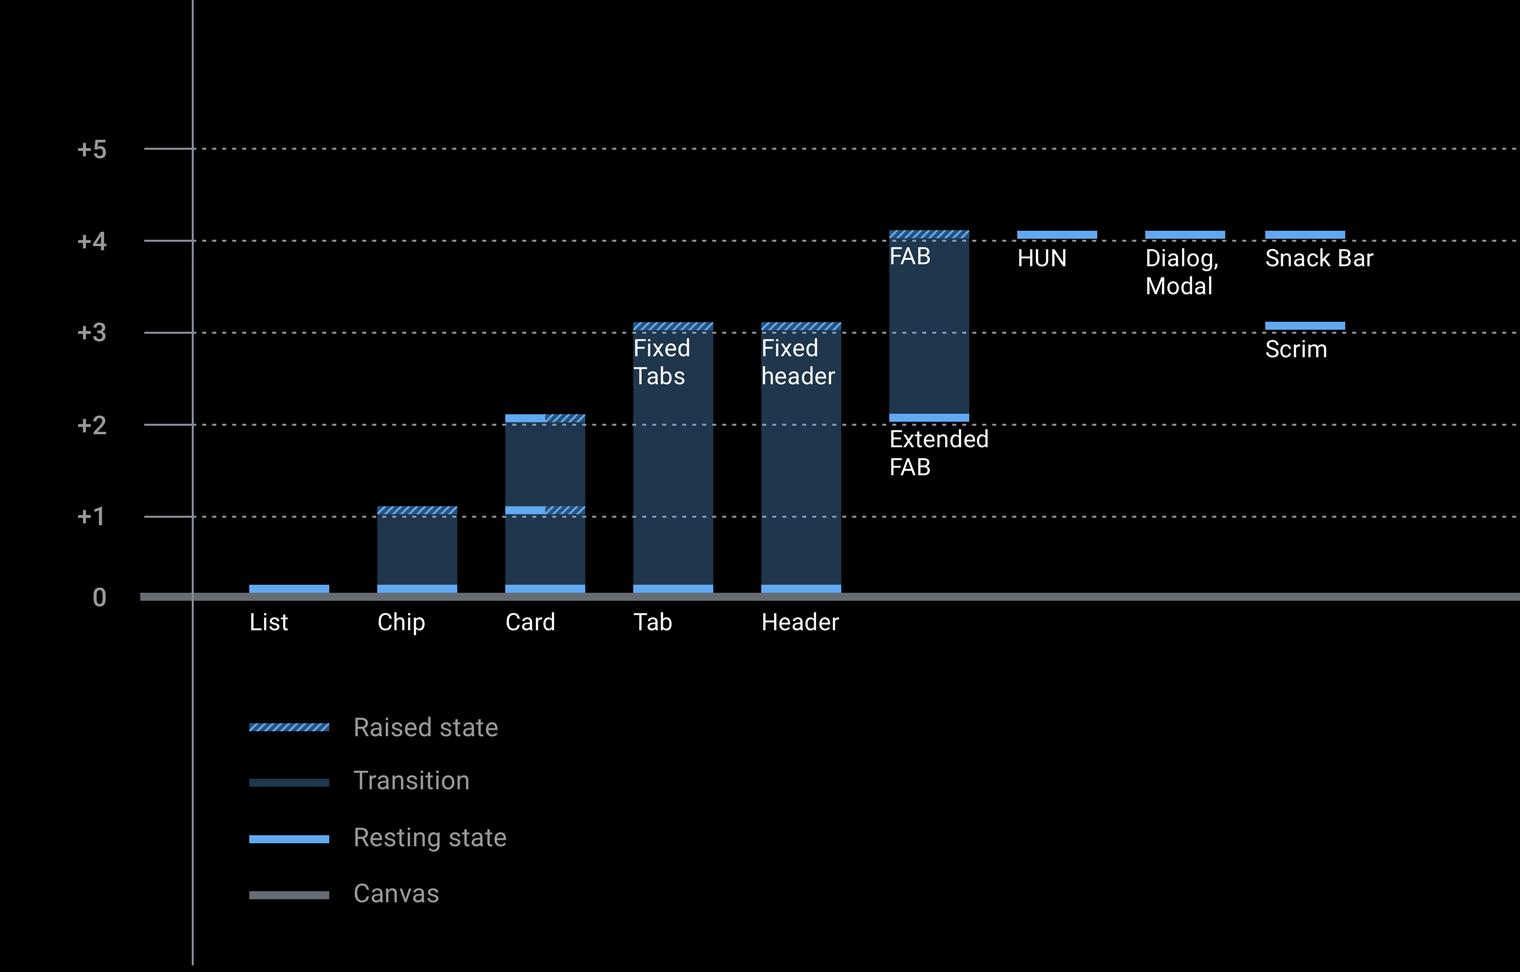 Component elevation chart